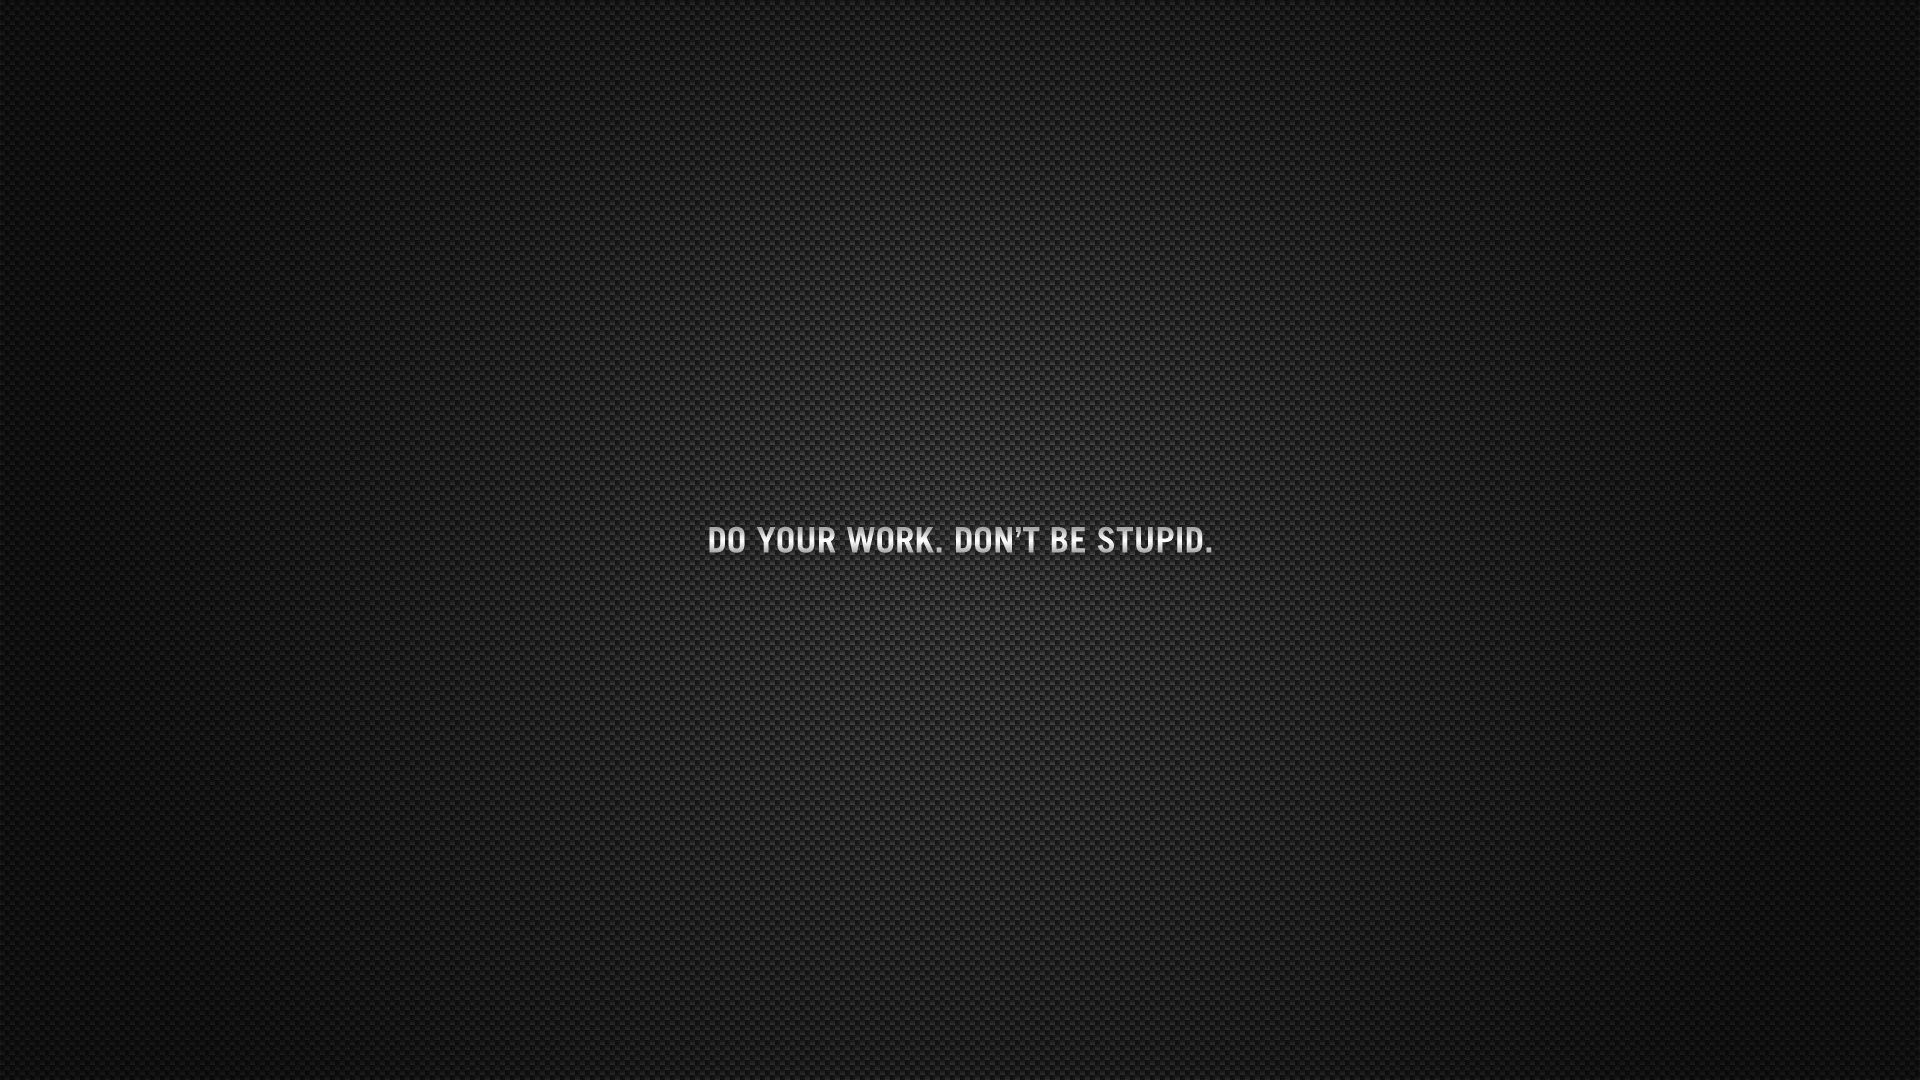 work black minimalistic text quotes deviantart 1920x1080 wallpaper